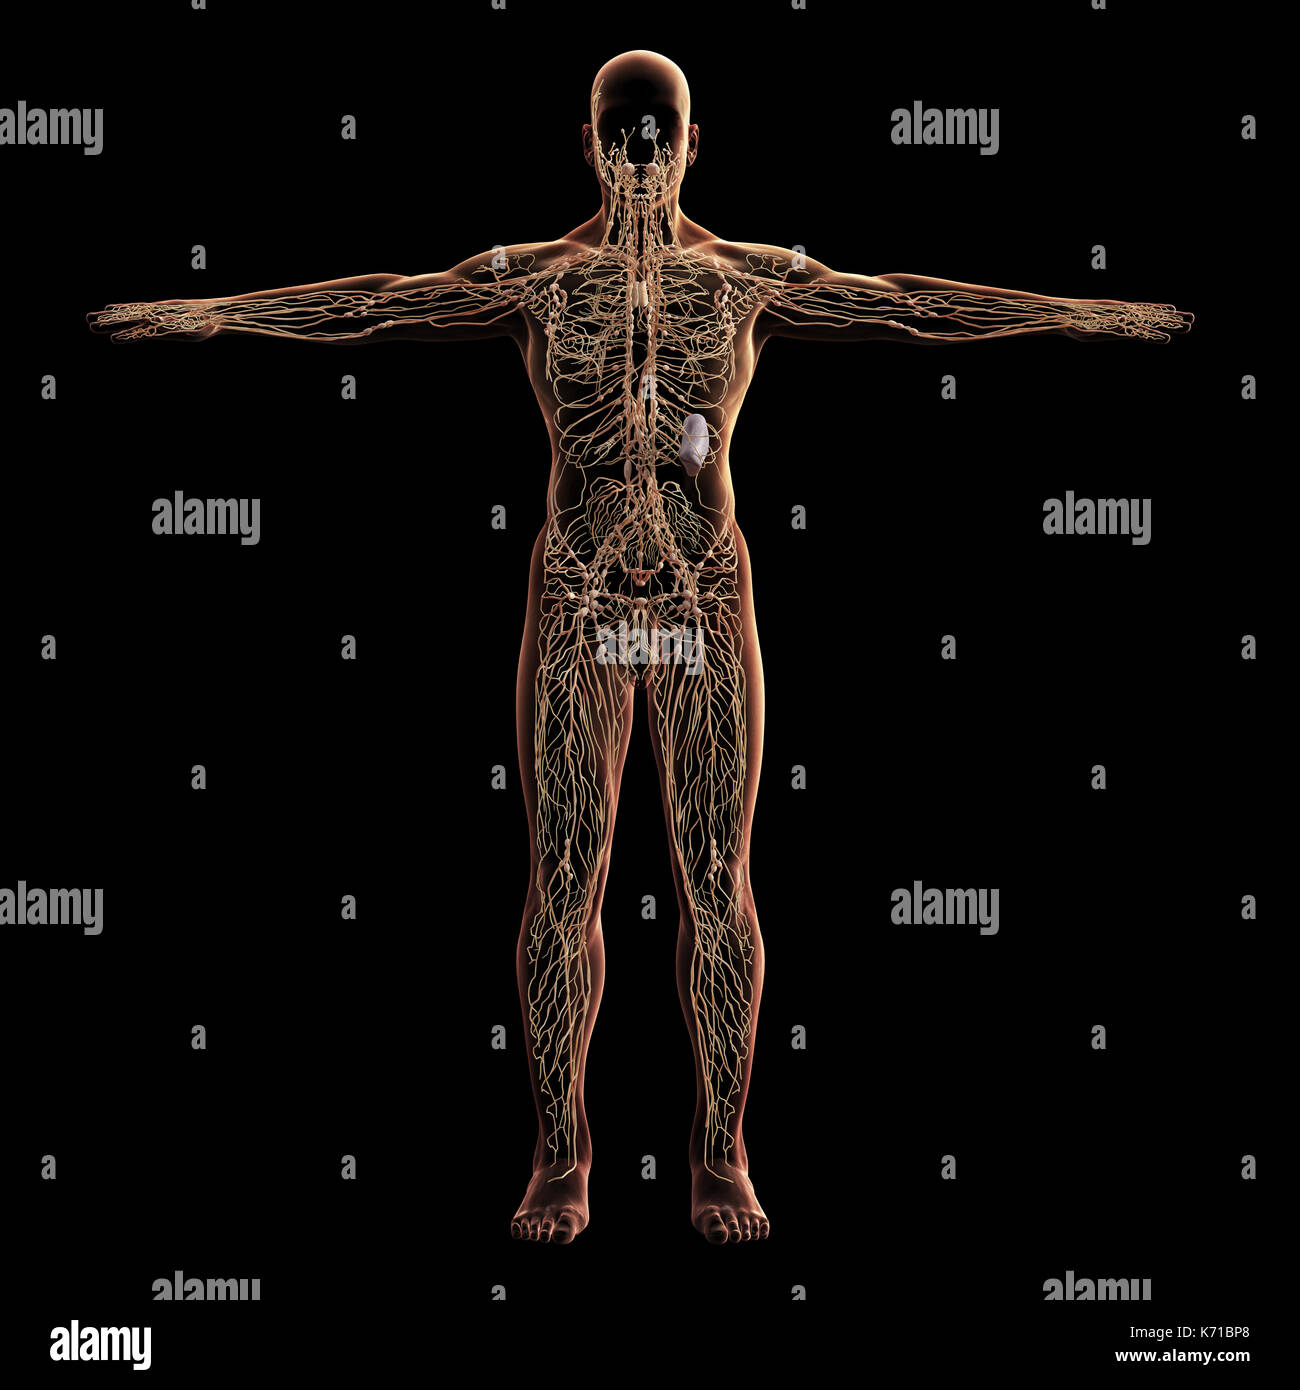 Digital model of lymphatic system, 3d rendering, black background - Stock Image